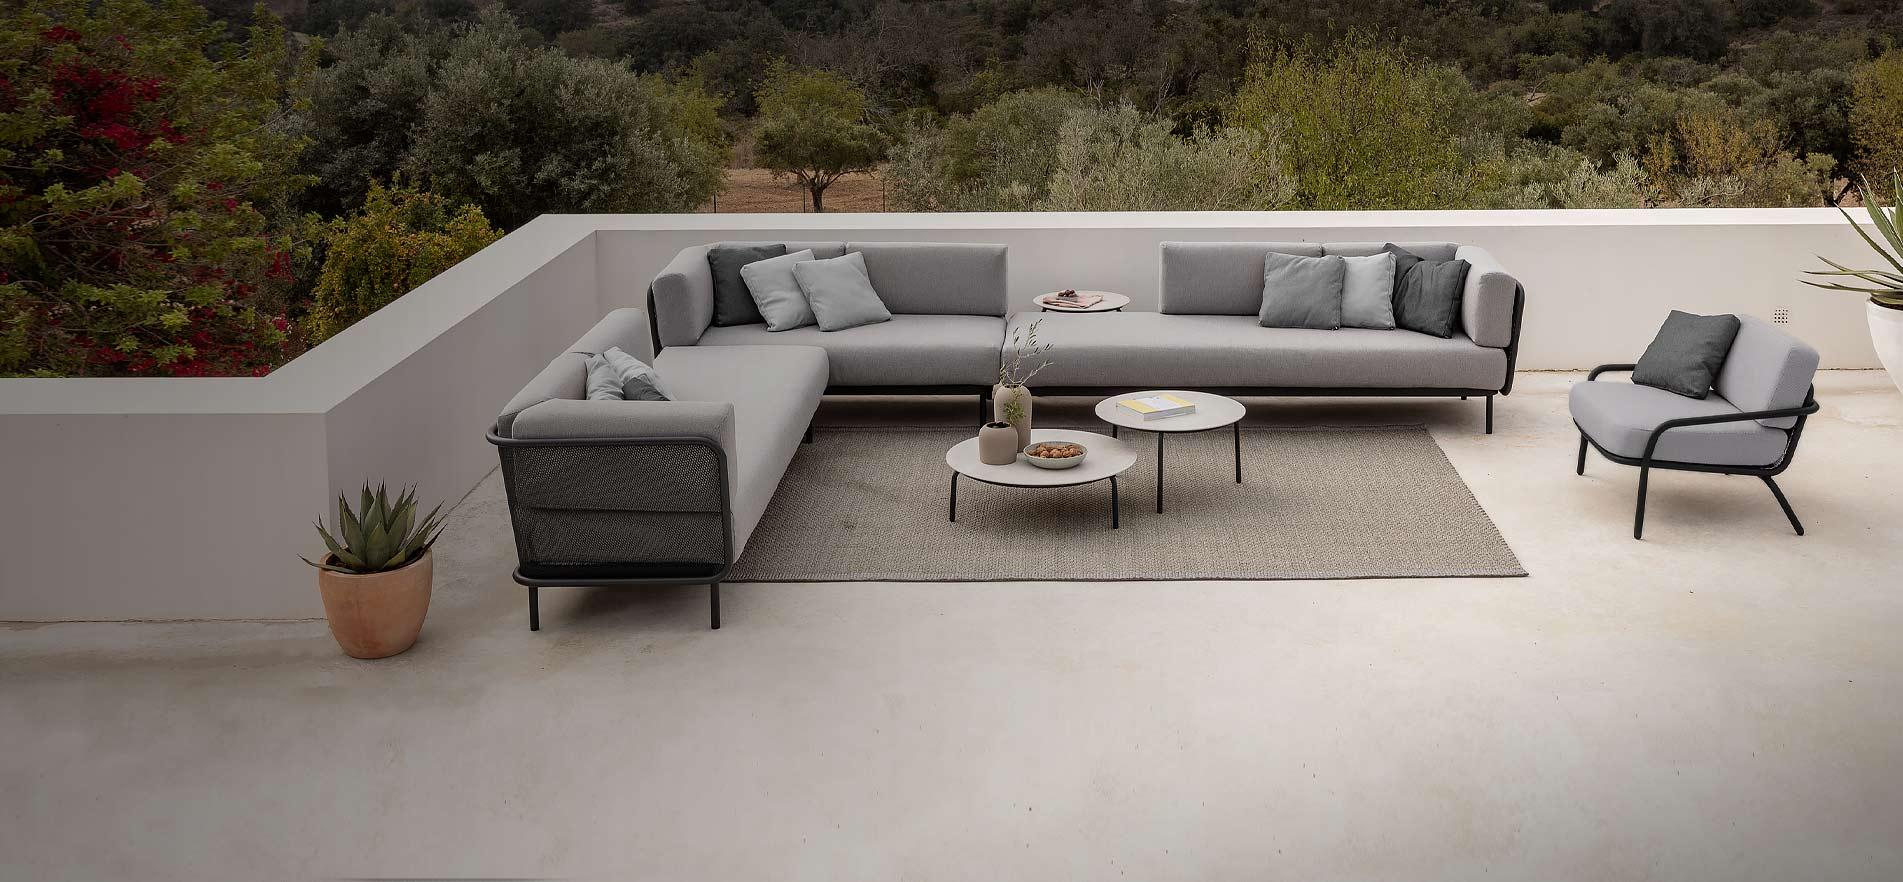 Design Design Gartensofas